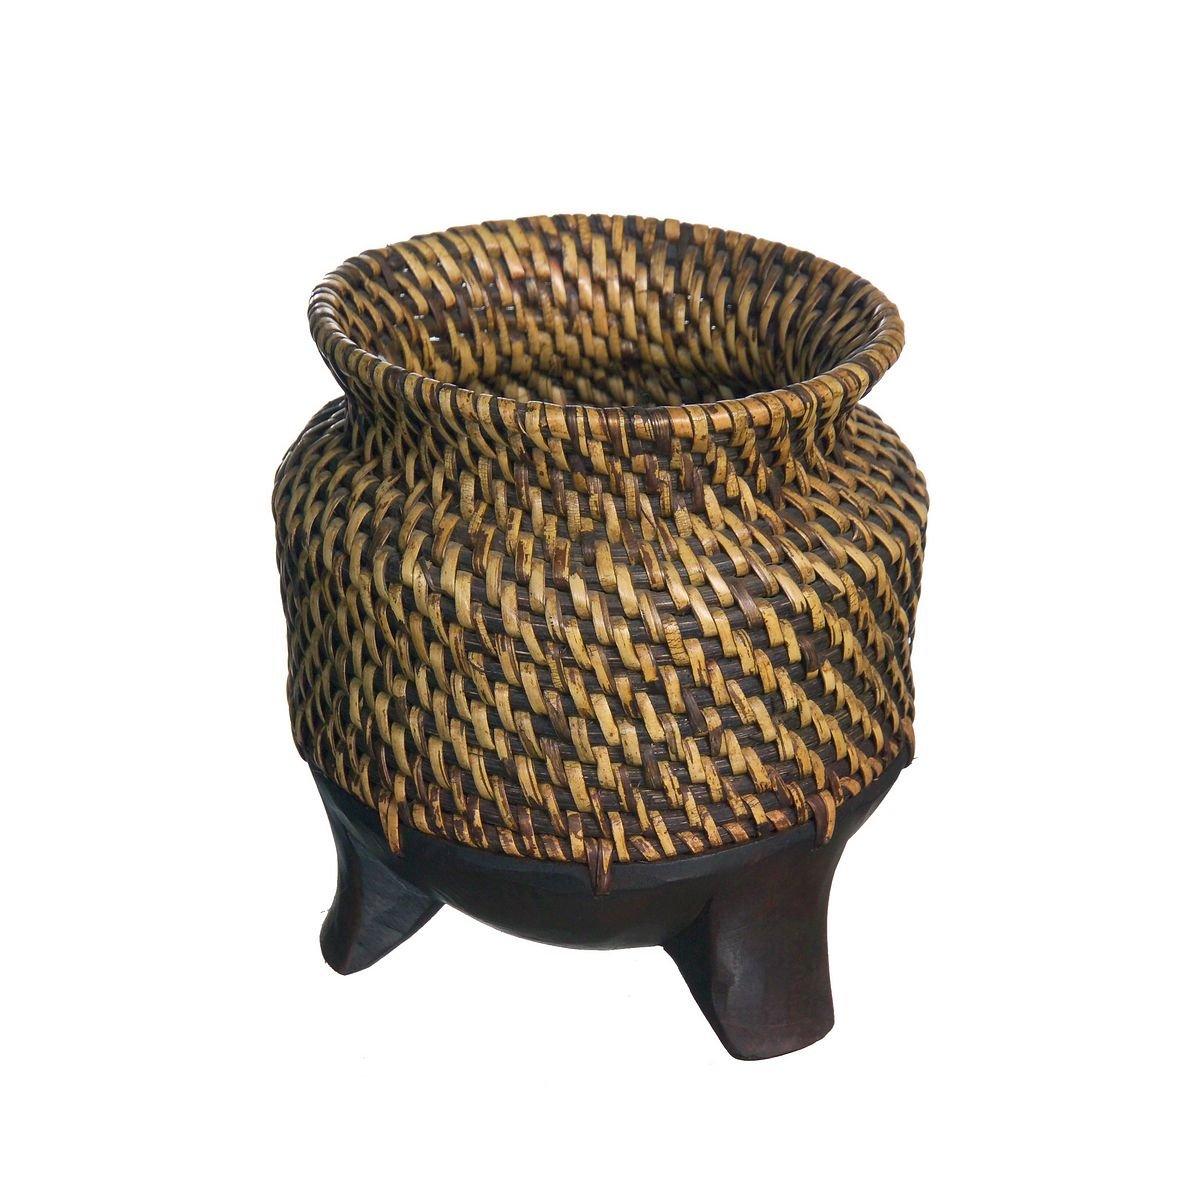 Discount Etnico - Vaso Acacia E Vimini Misura 16 x 15 cm